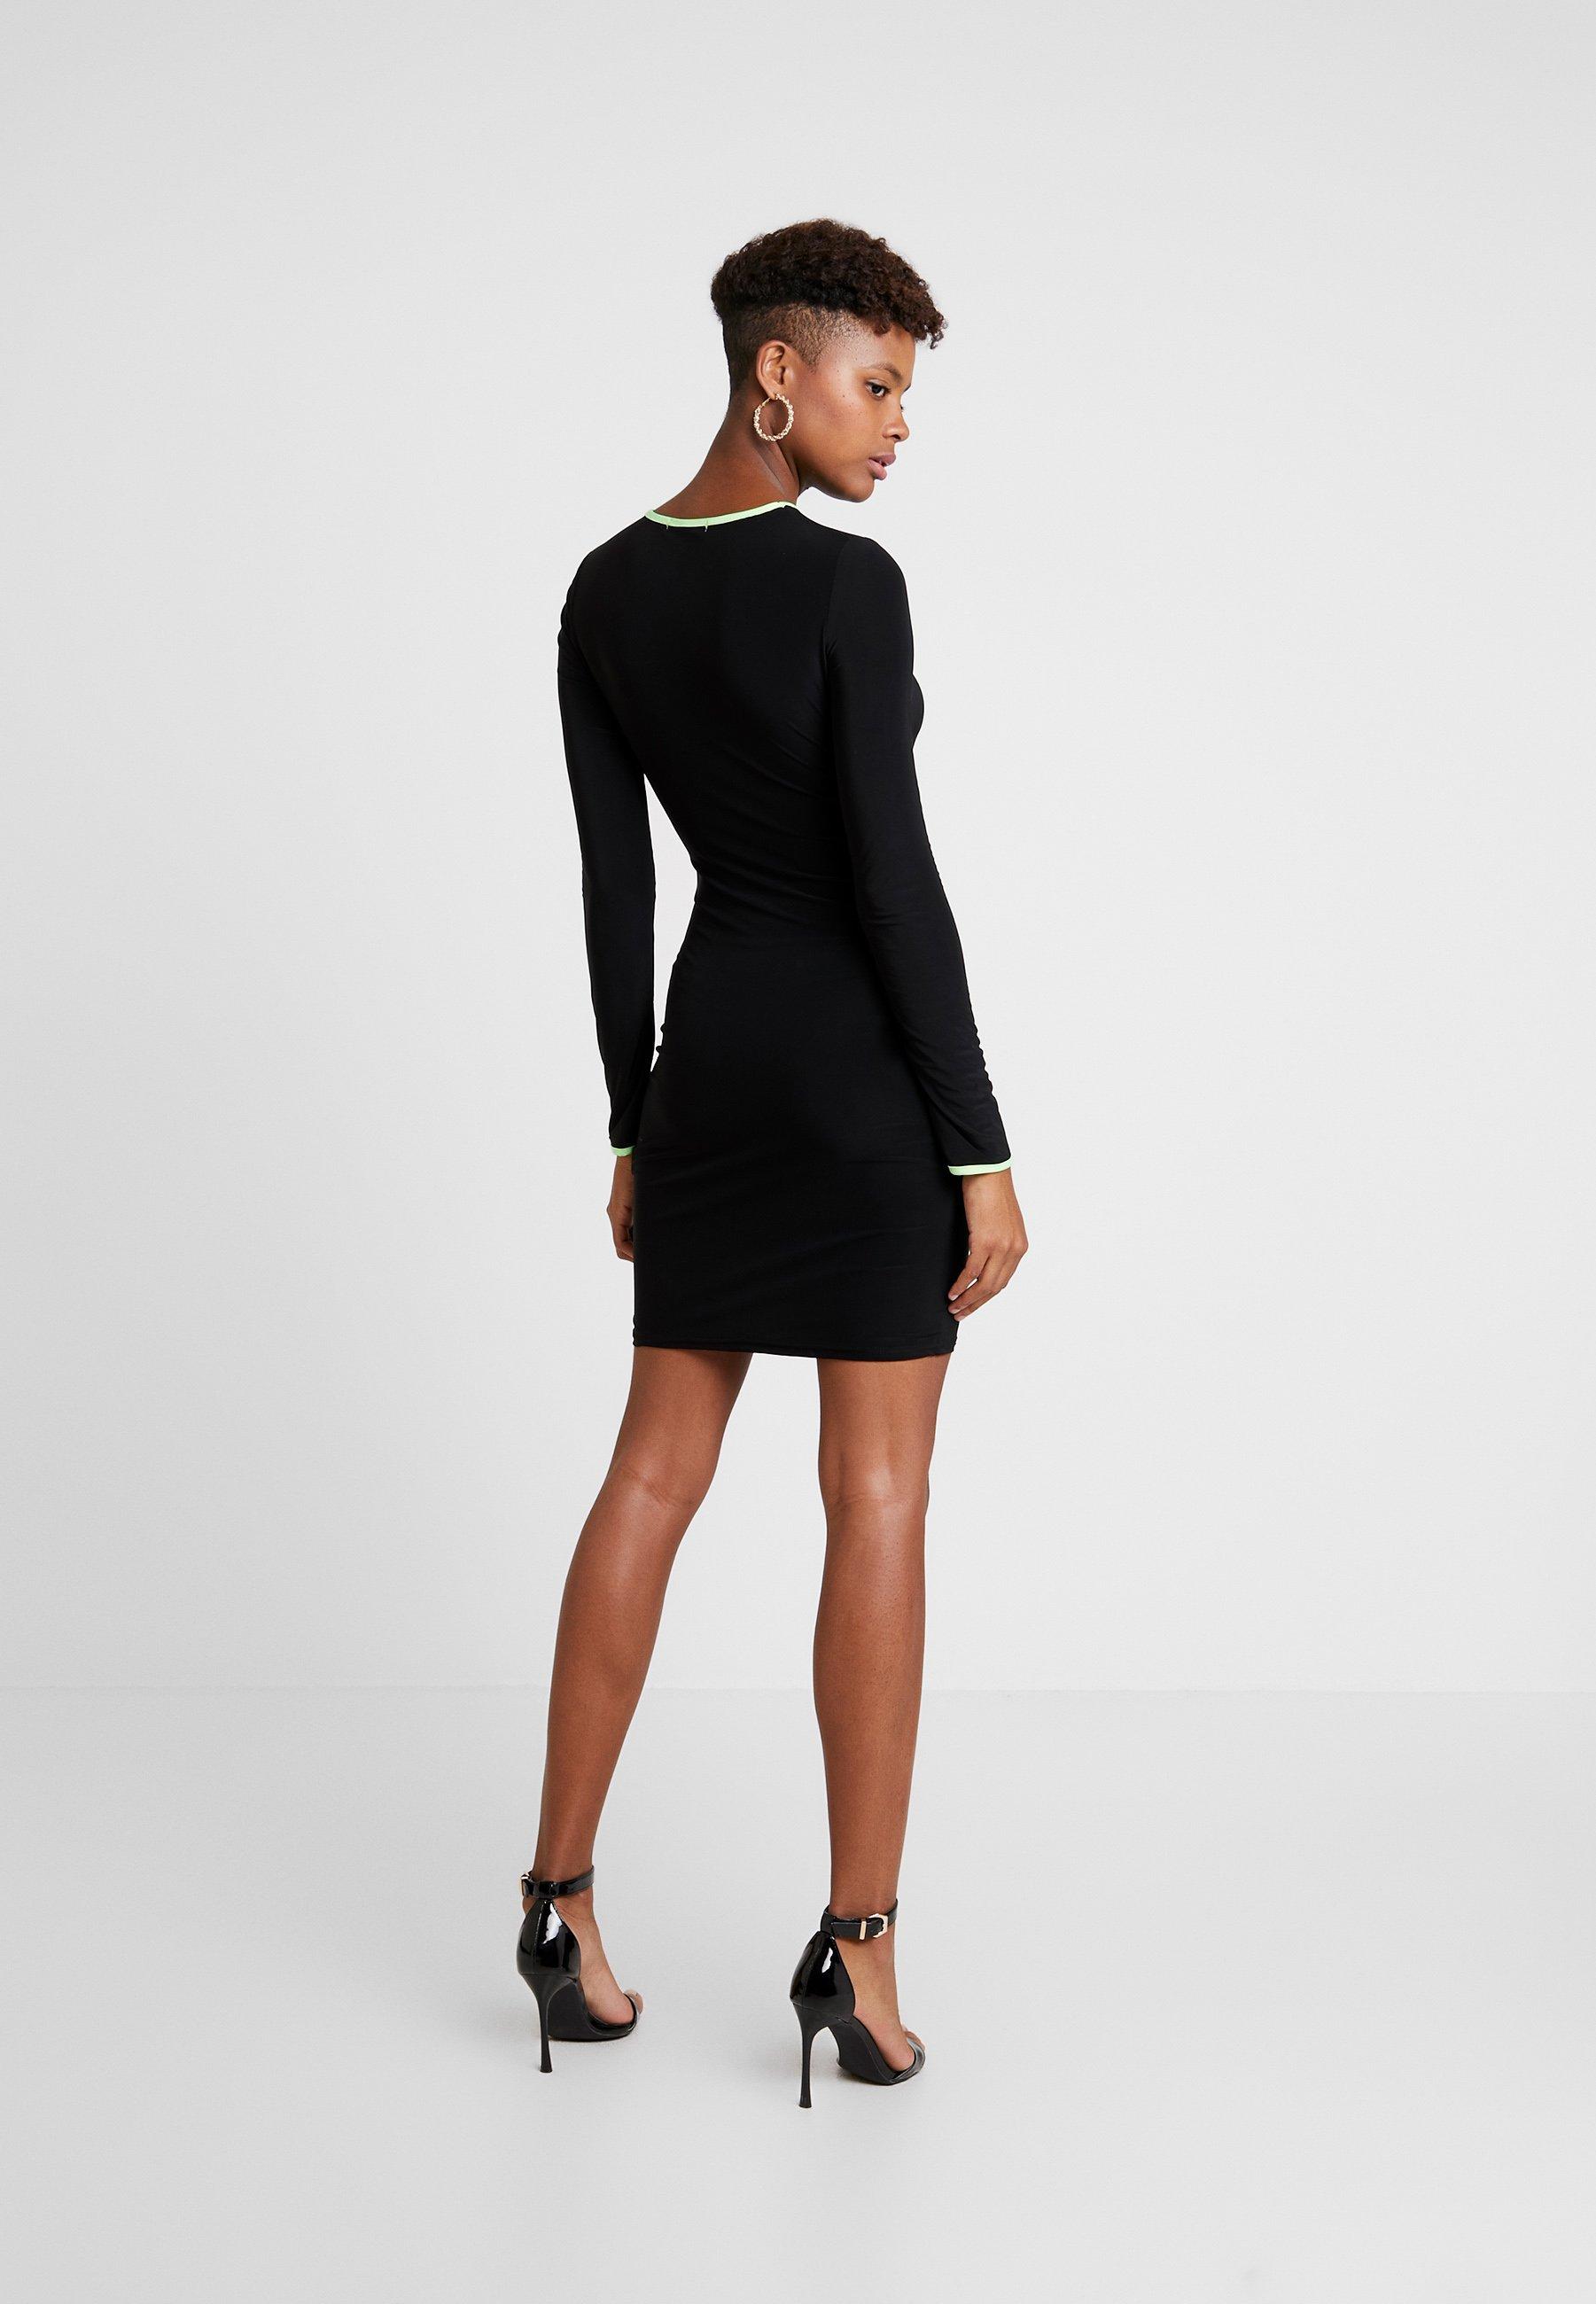 Missguided Mini Out Cut DressRobe Black Piping Jersey Slinky En O8nXPwk0